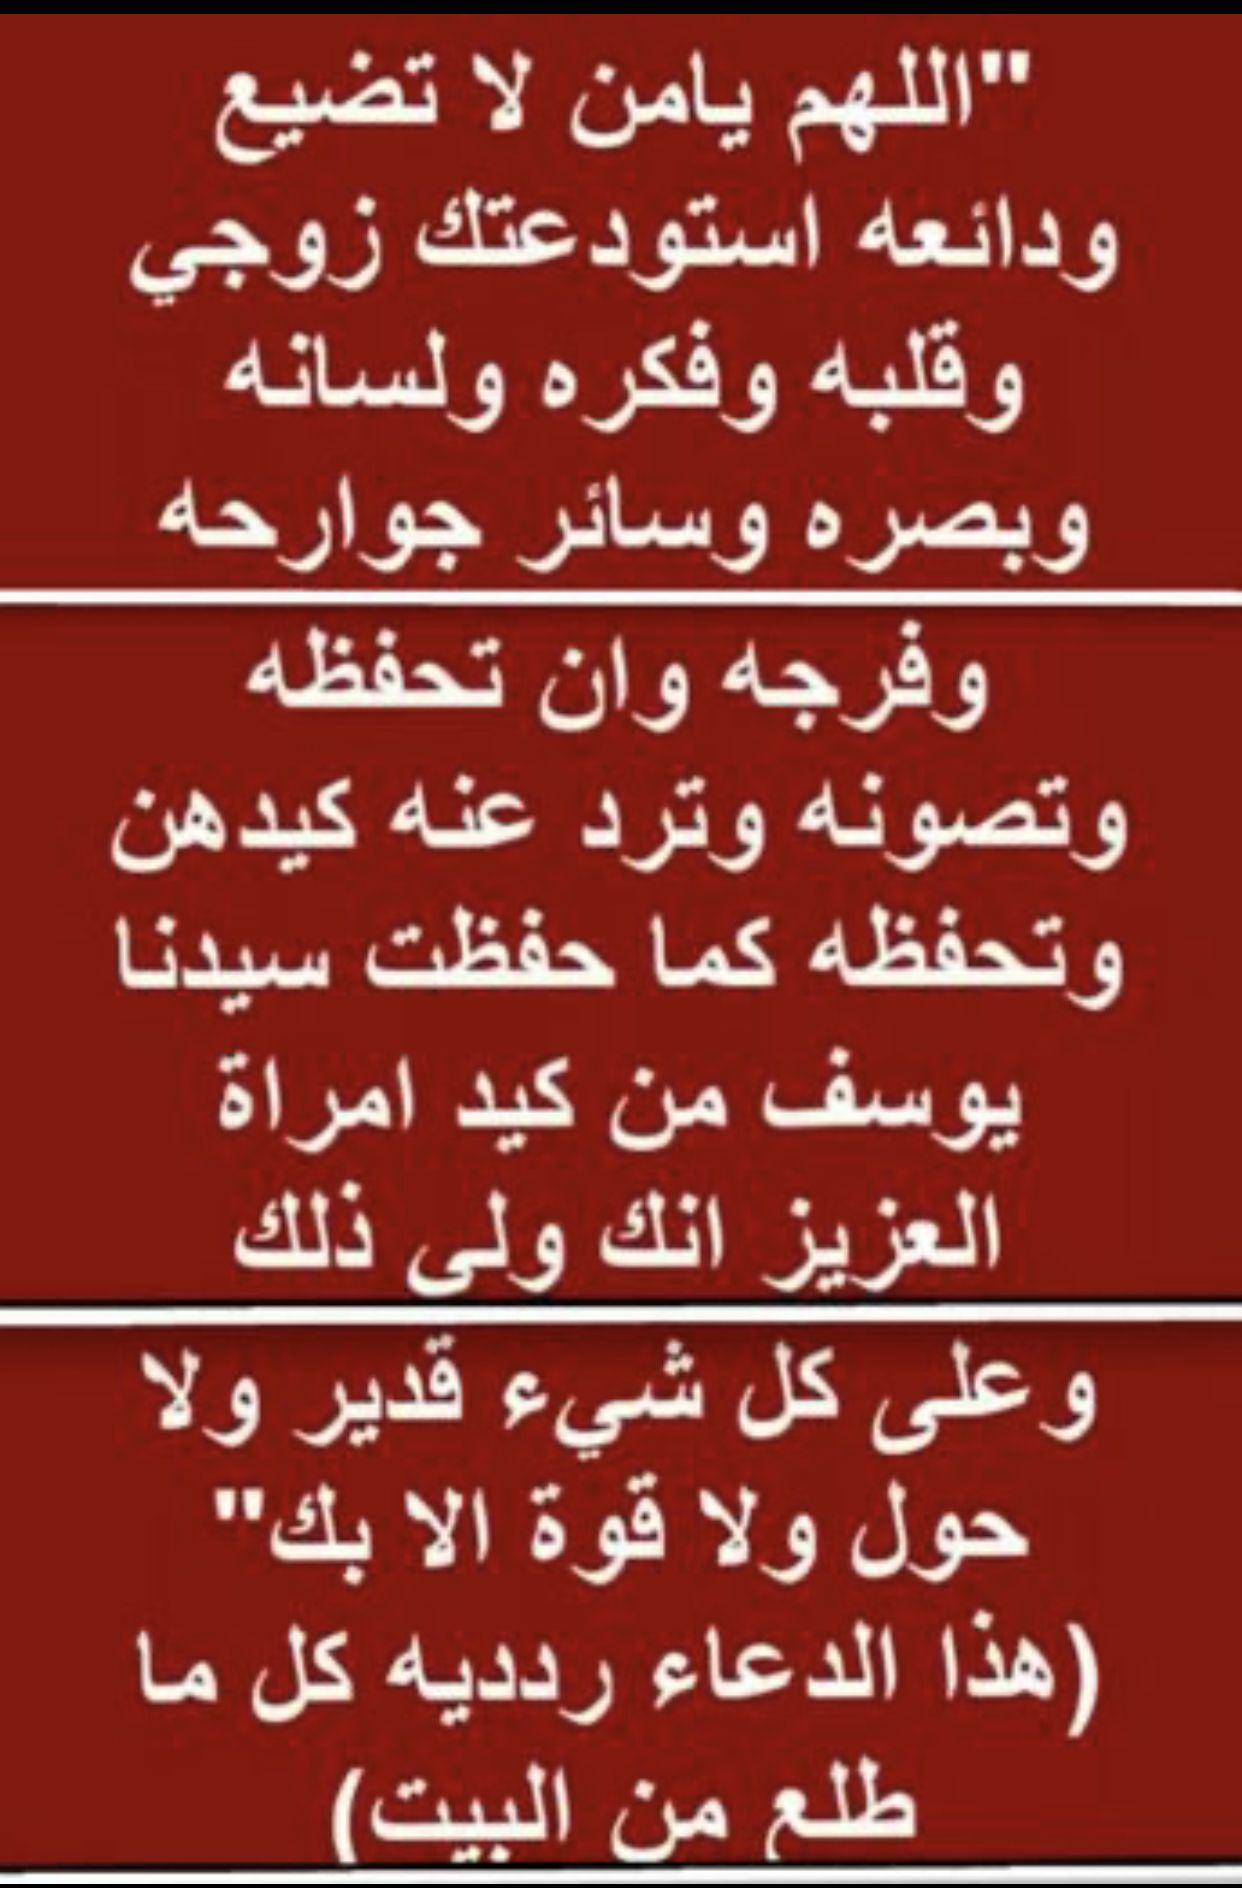 Pin By علمتني الحياة On اذكارات Islam Facts Islam Beliefs Islam Quran